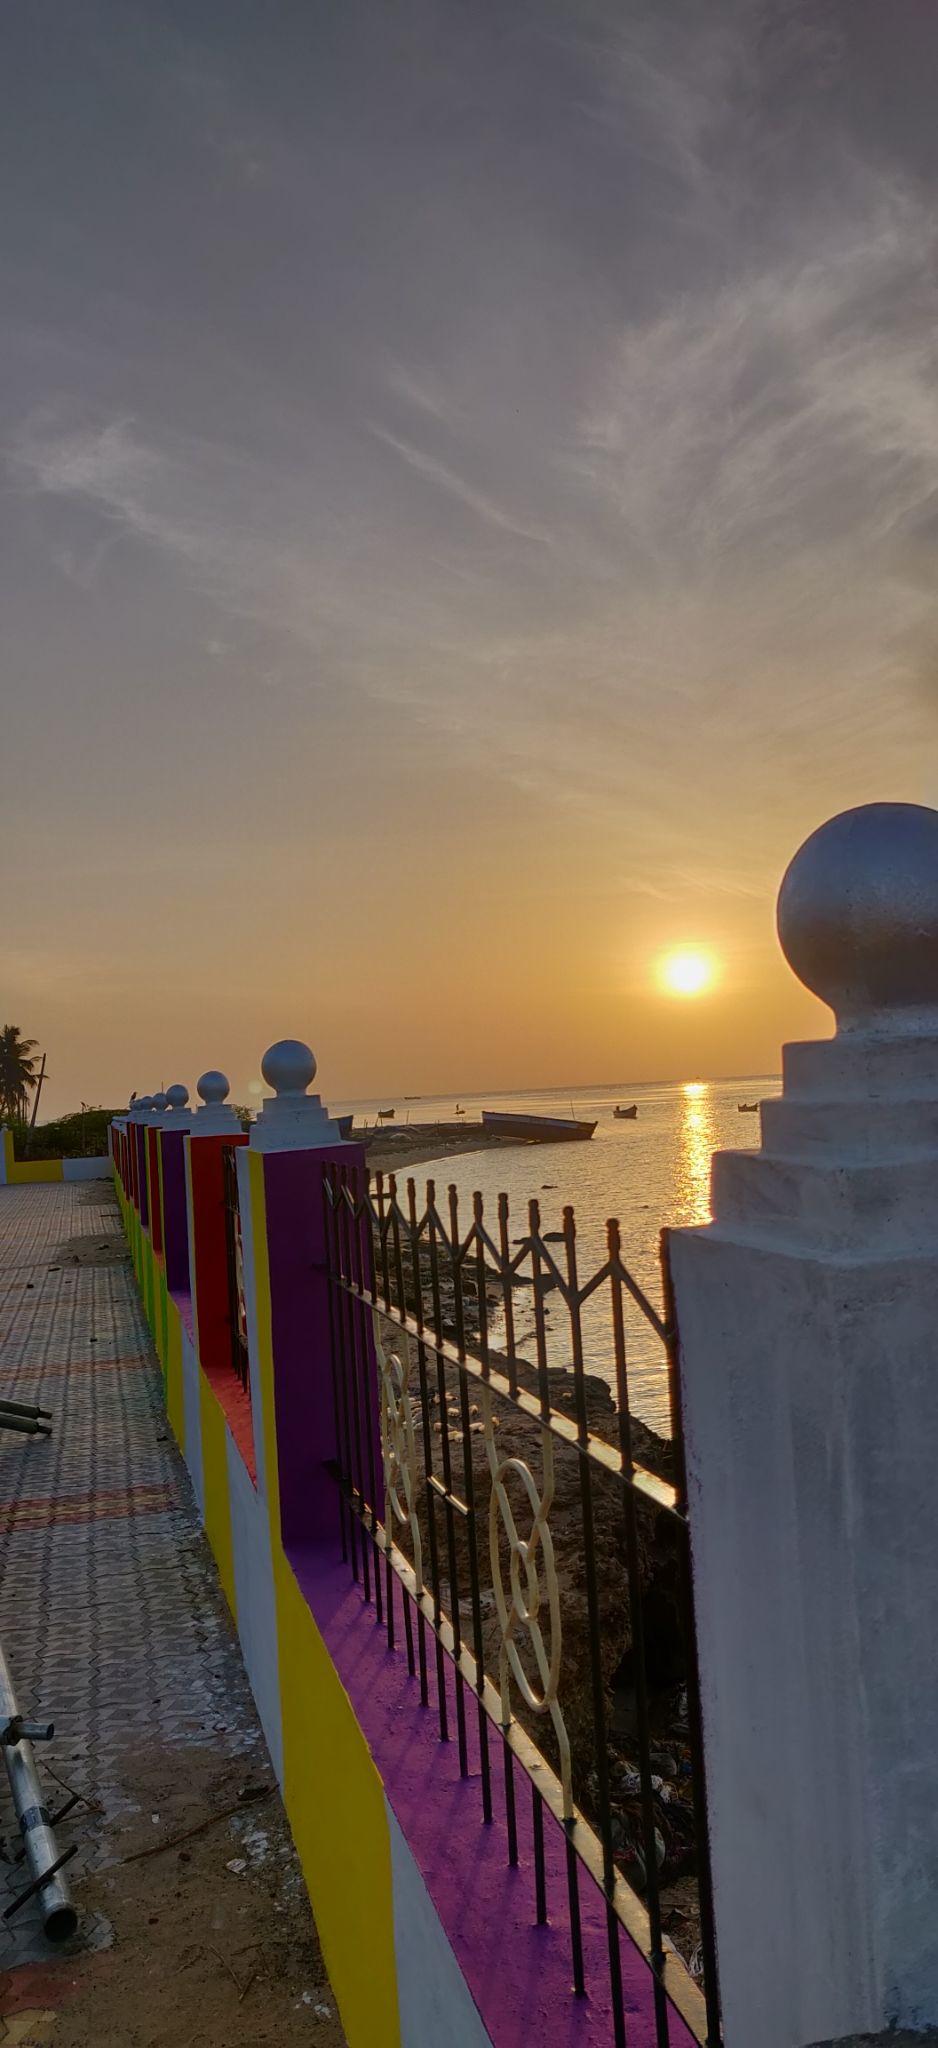 Photo of Rameswaram By Chellappa Subramaniam